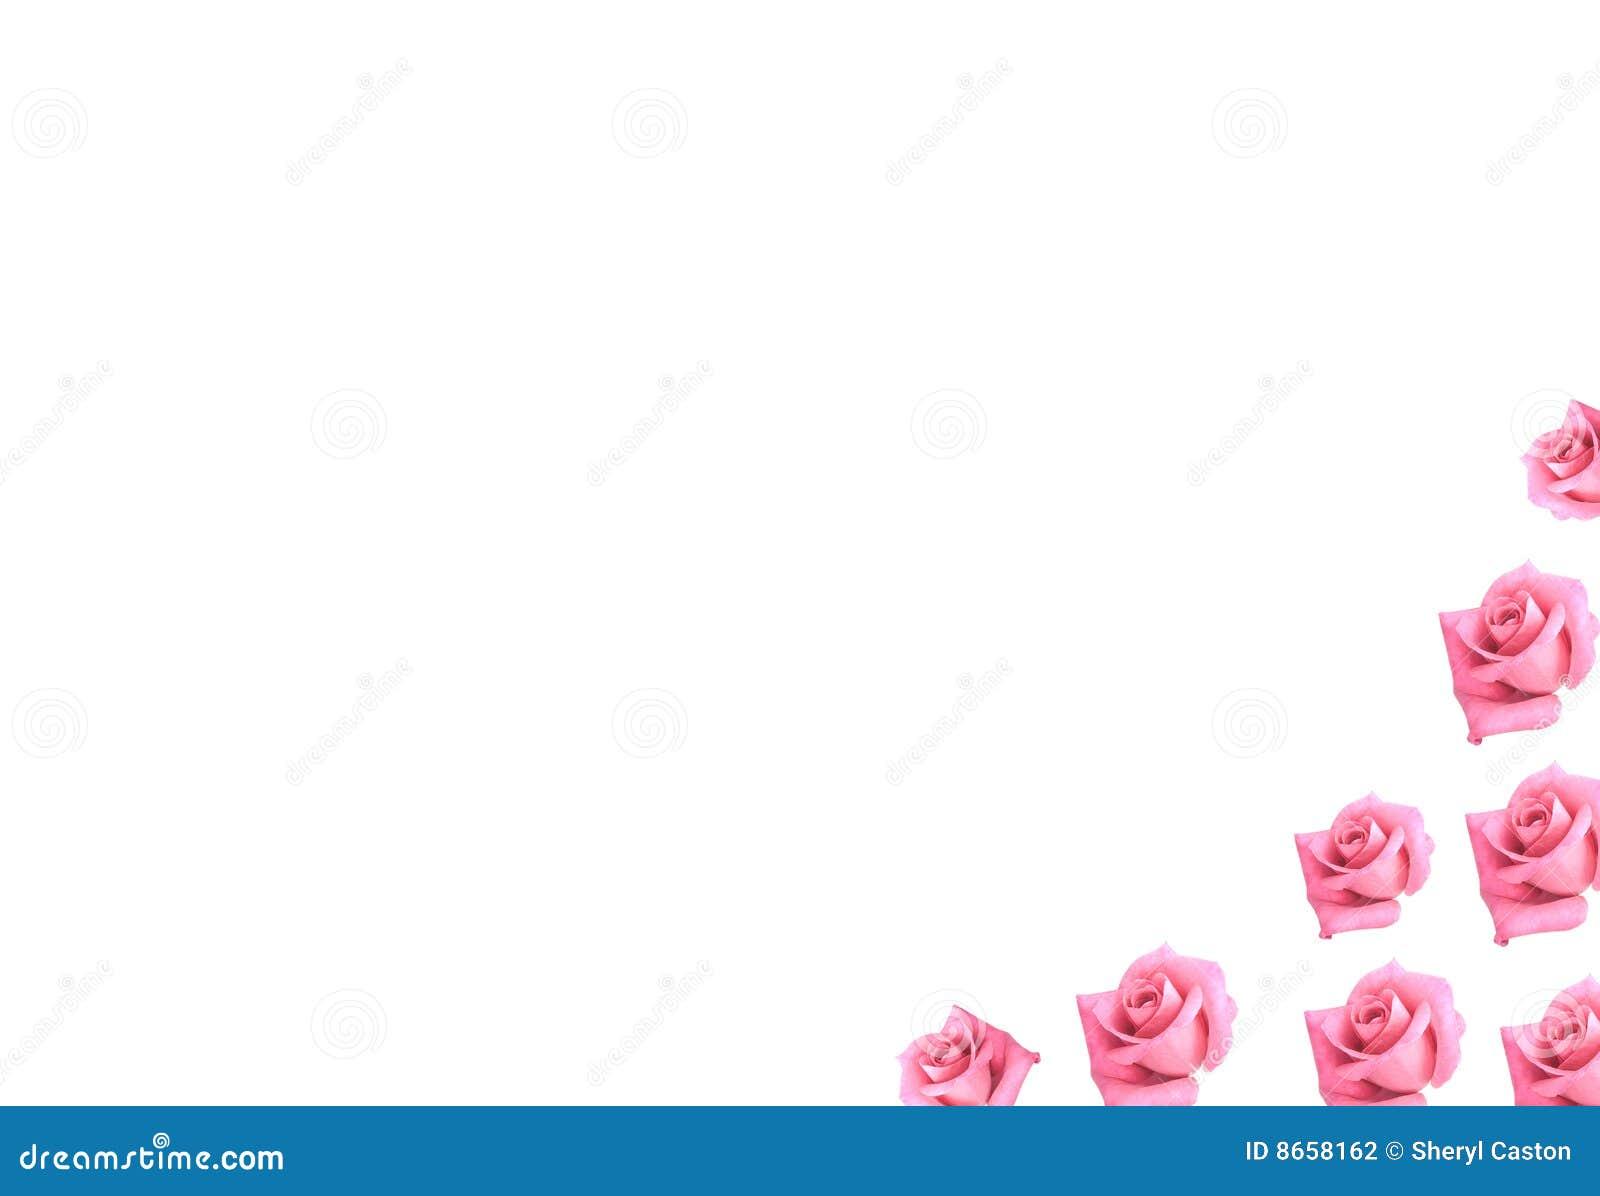 Fondo Primavera álbum Classic Flor Y Estrellas: Fundo Scrapbooking Da Beira Cor-de-rosa Das Flores Das